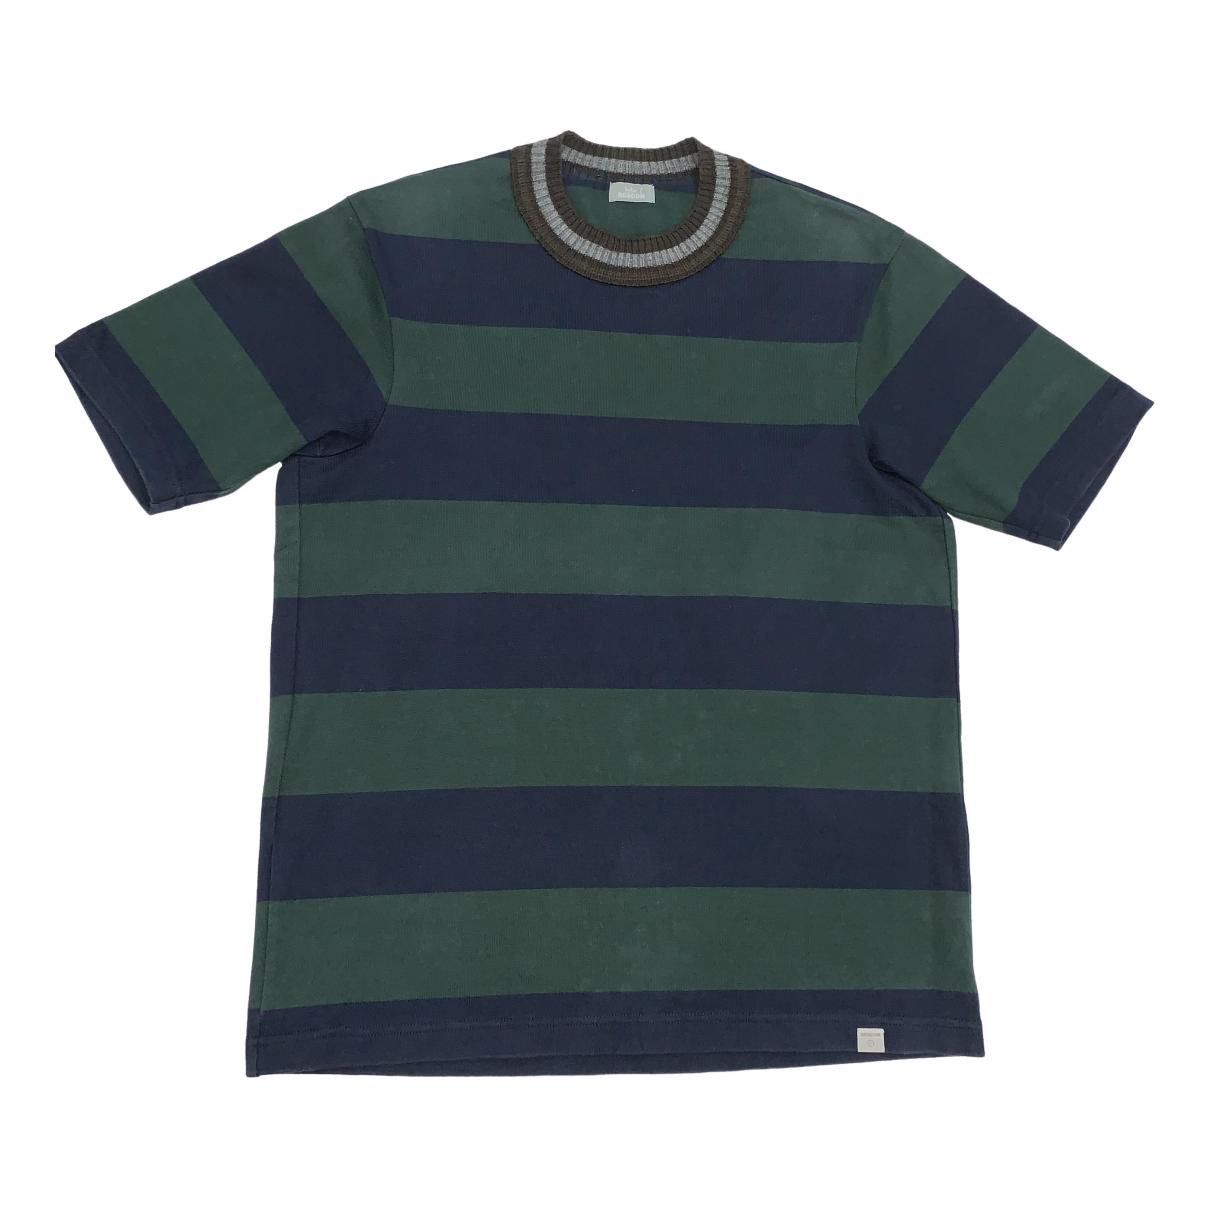 Kolor \N Green Cotton T-shirts for Men 1 0 - 6